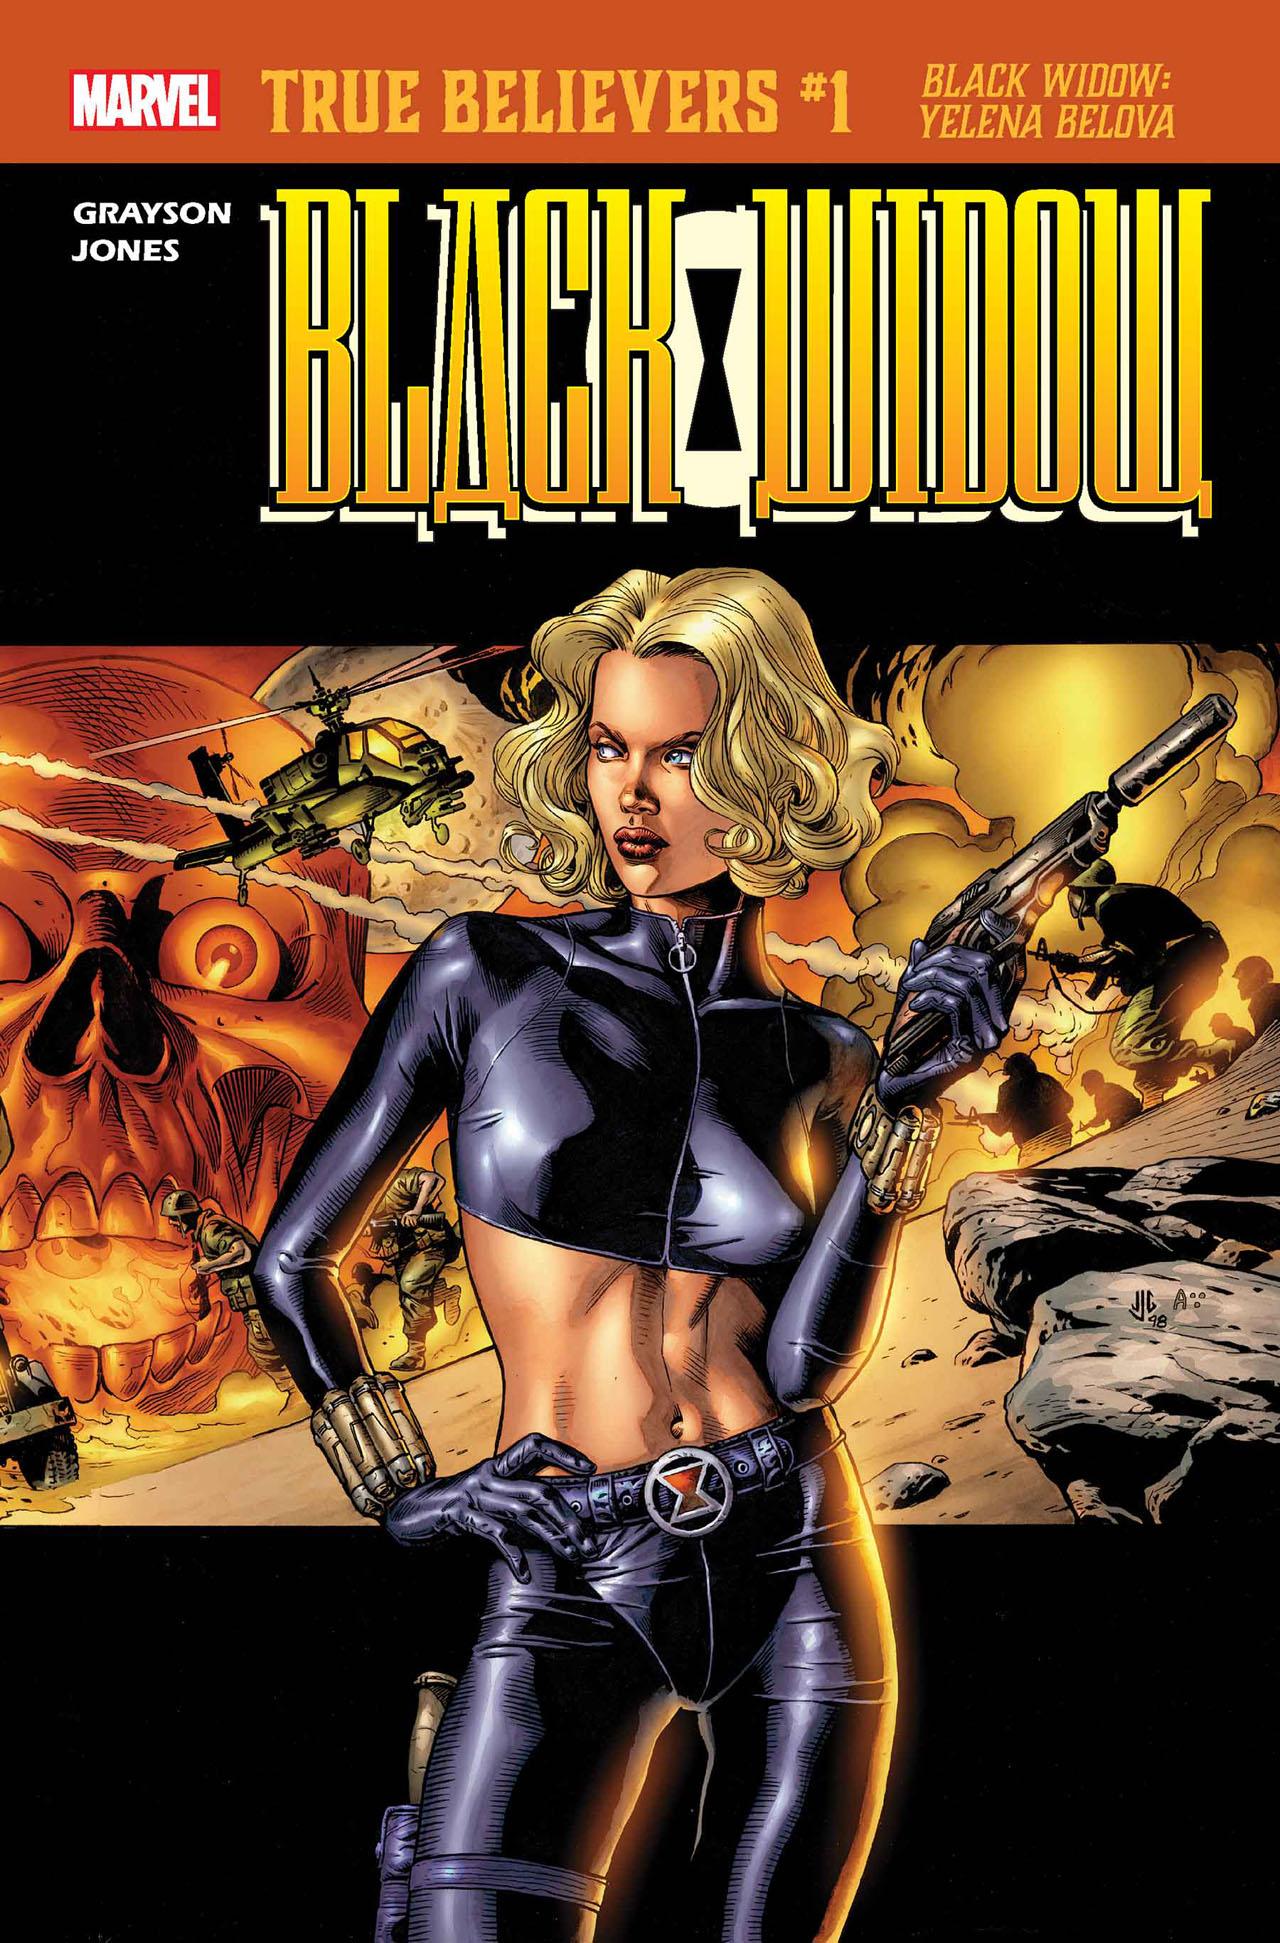 True Believers: Black Widow - Yelena Belova Vol 1 1